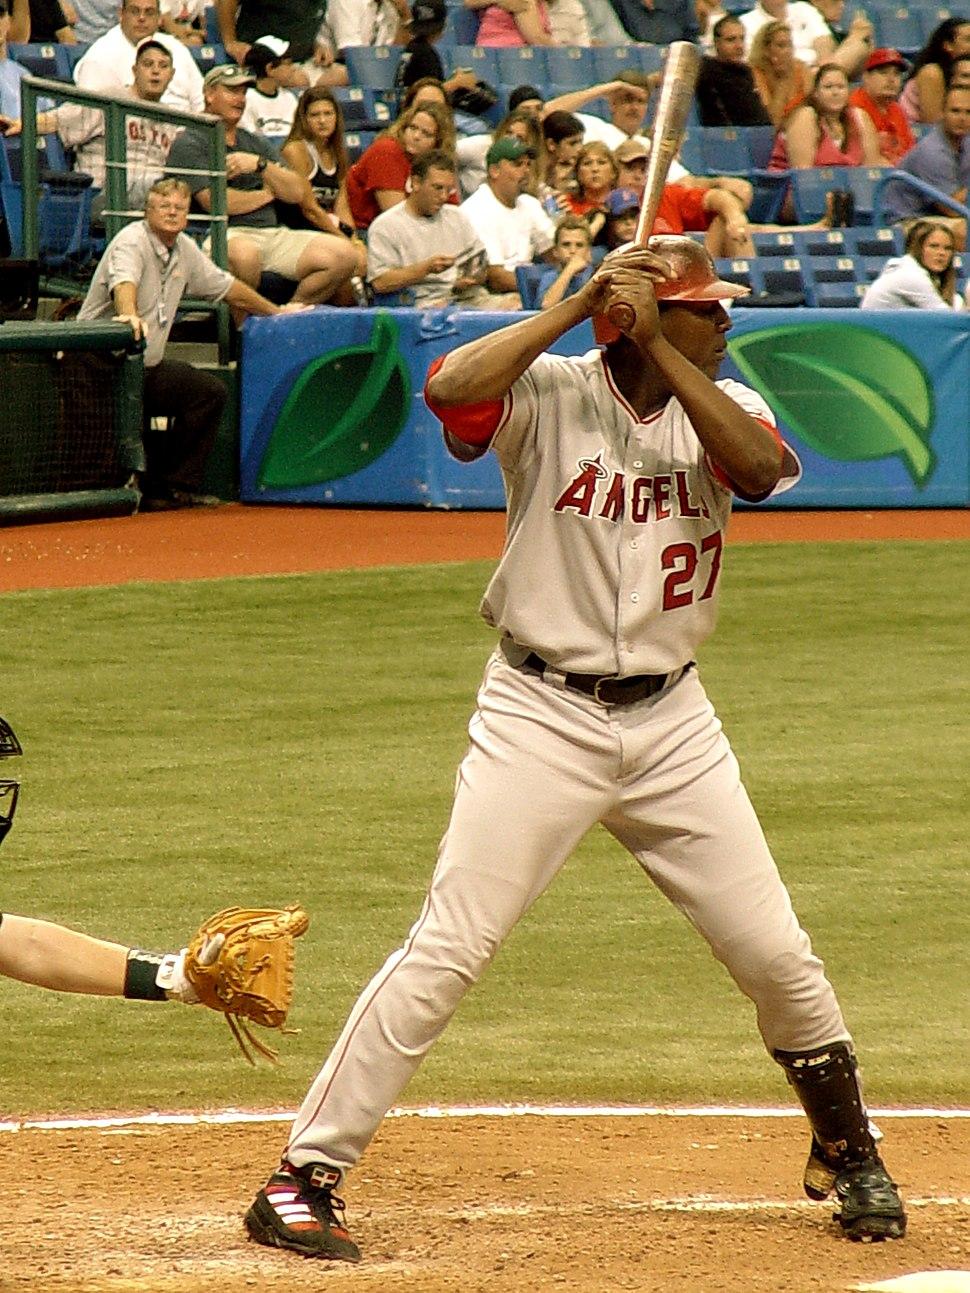 Vladimir Guerrero at bat, August 28, 2005 (2)